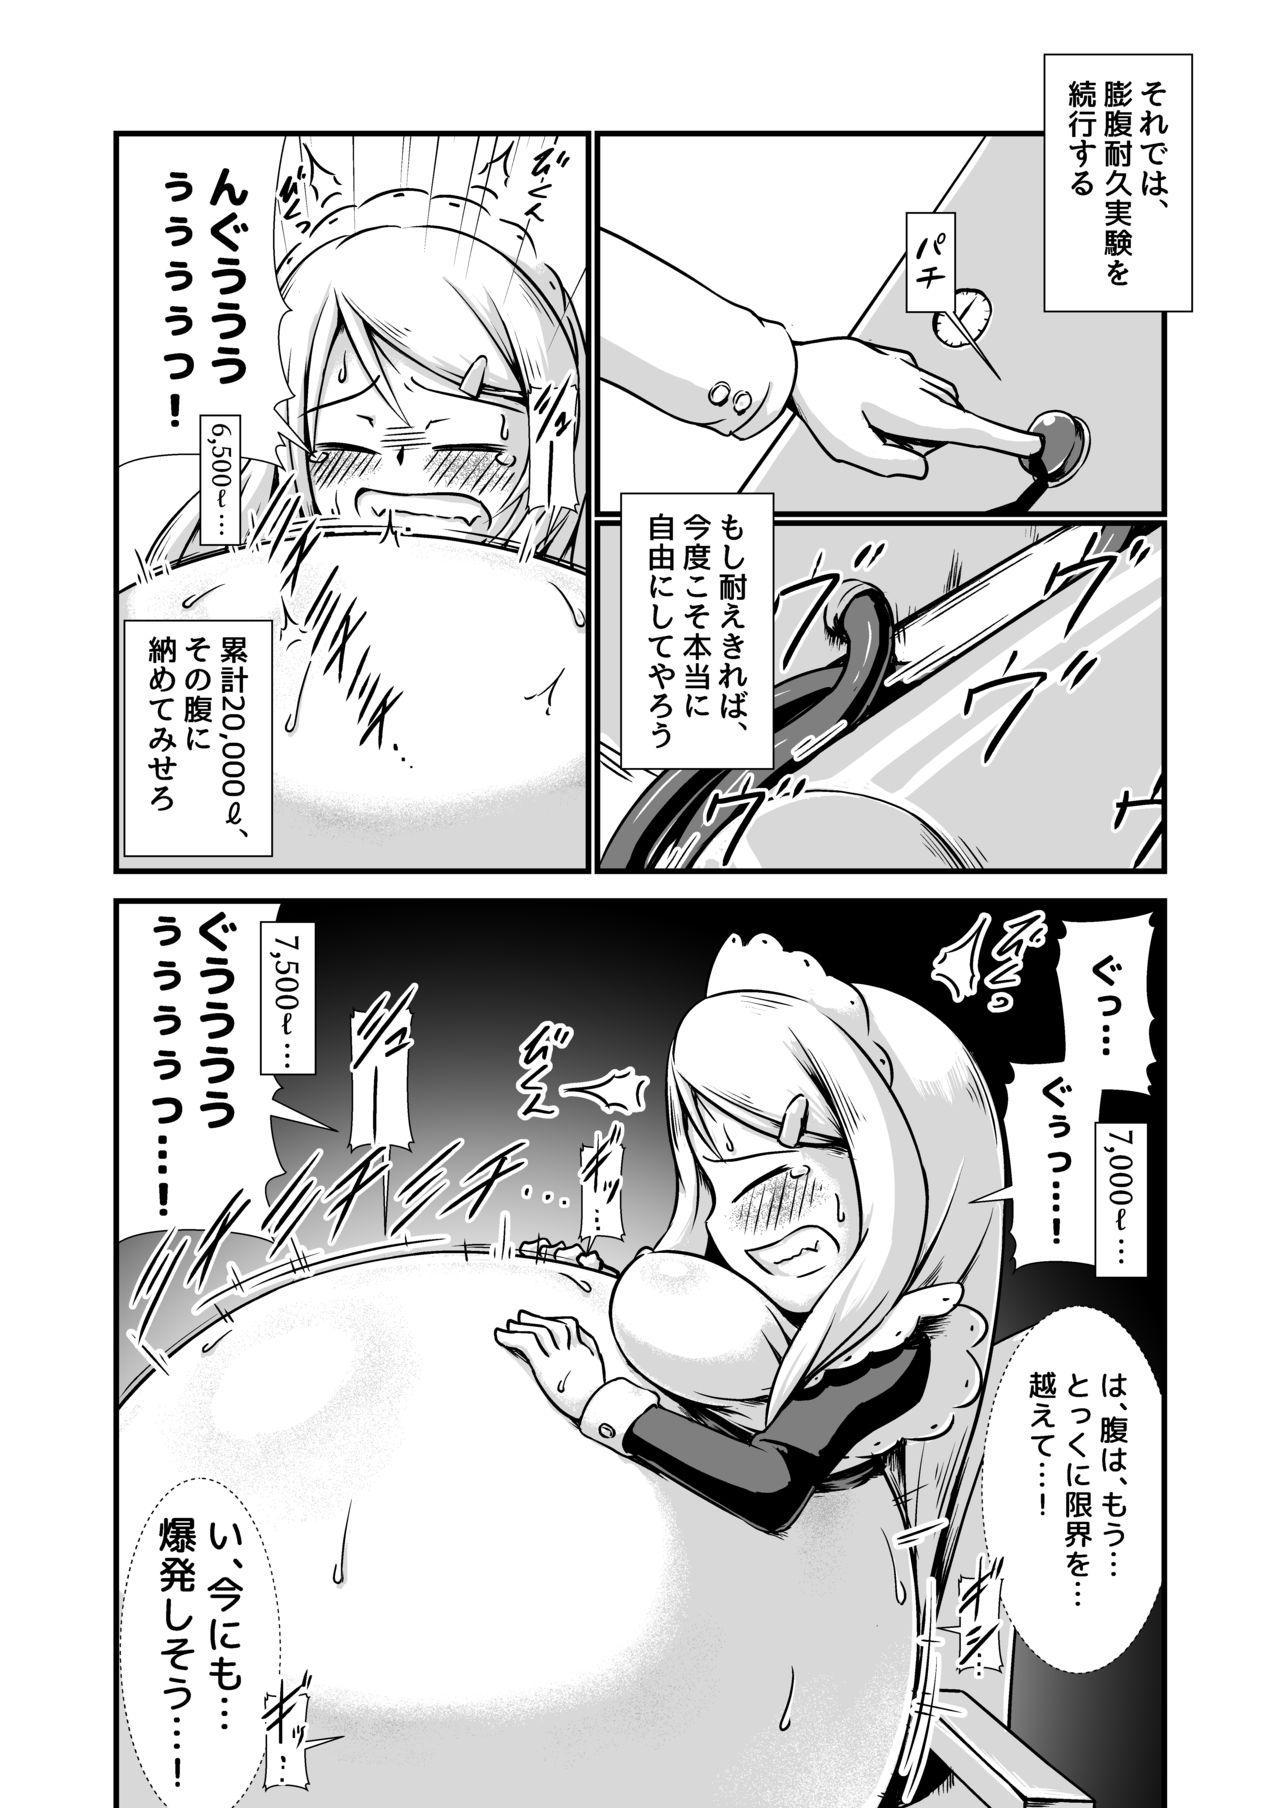 Maid-san Boufuku Taikyuu Jikken 9